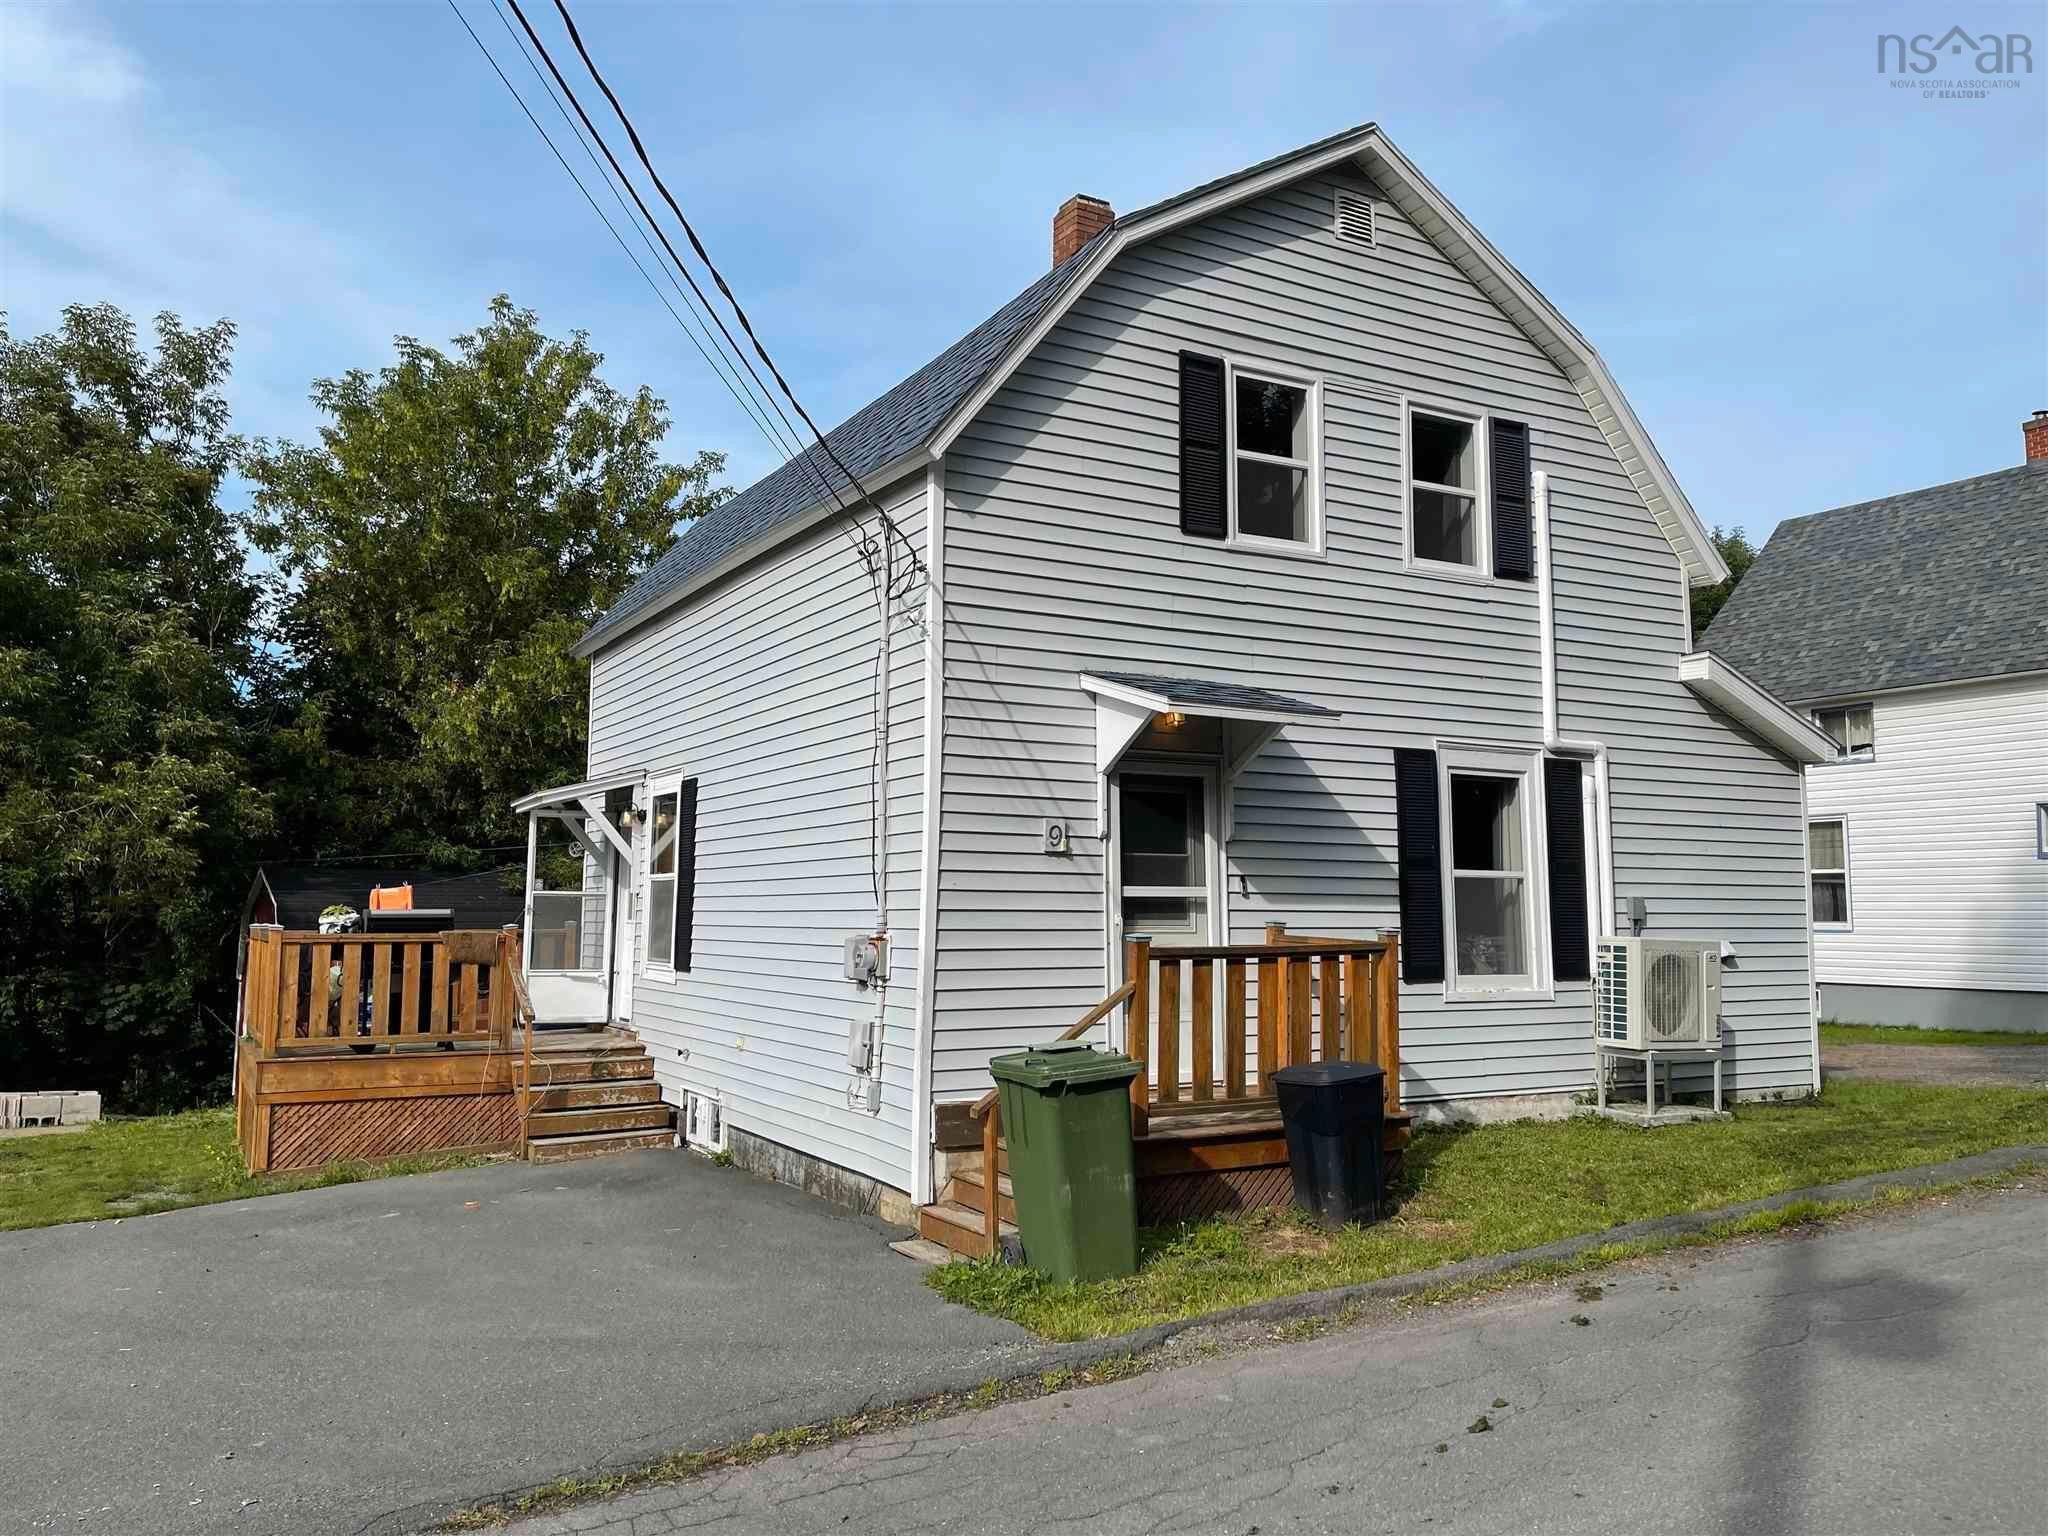 Main Photo: 9 Brook Street in Trenton: 107-Trenton,Westville,Pictou Residential for sale (Northern Region)  : MLS®# 202124817